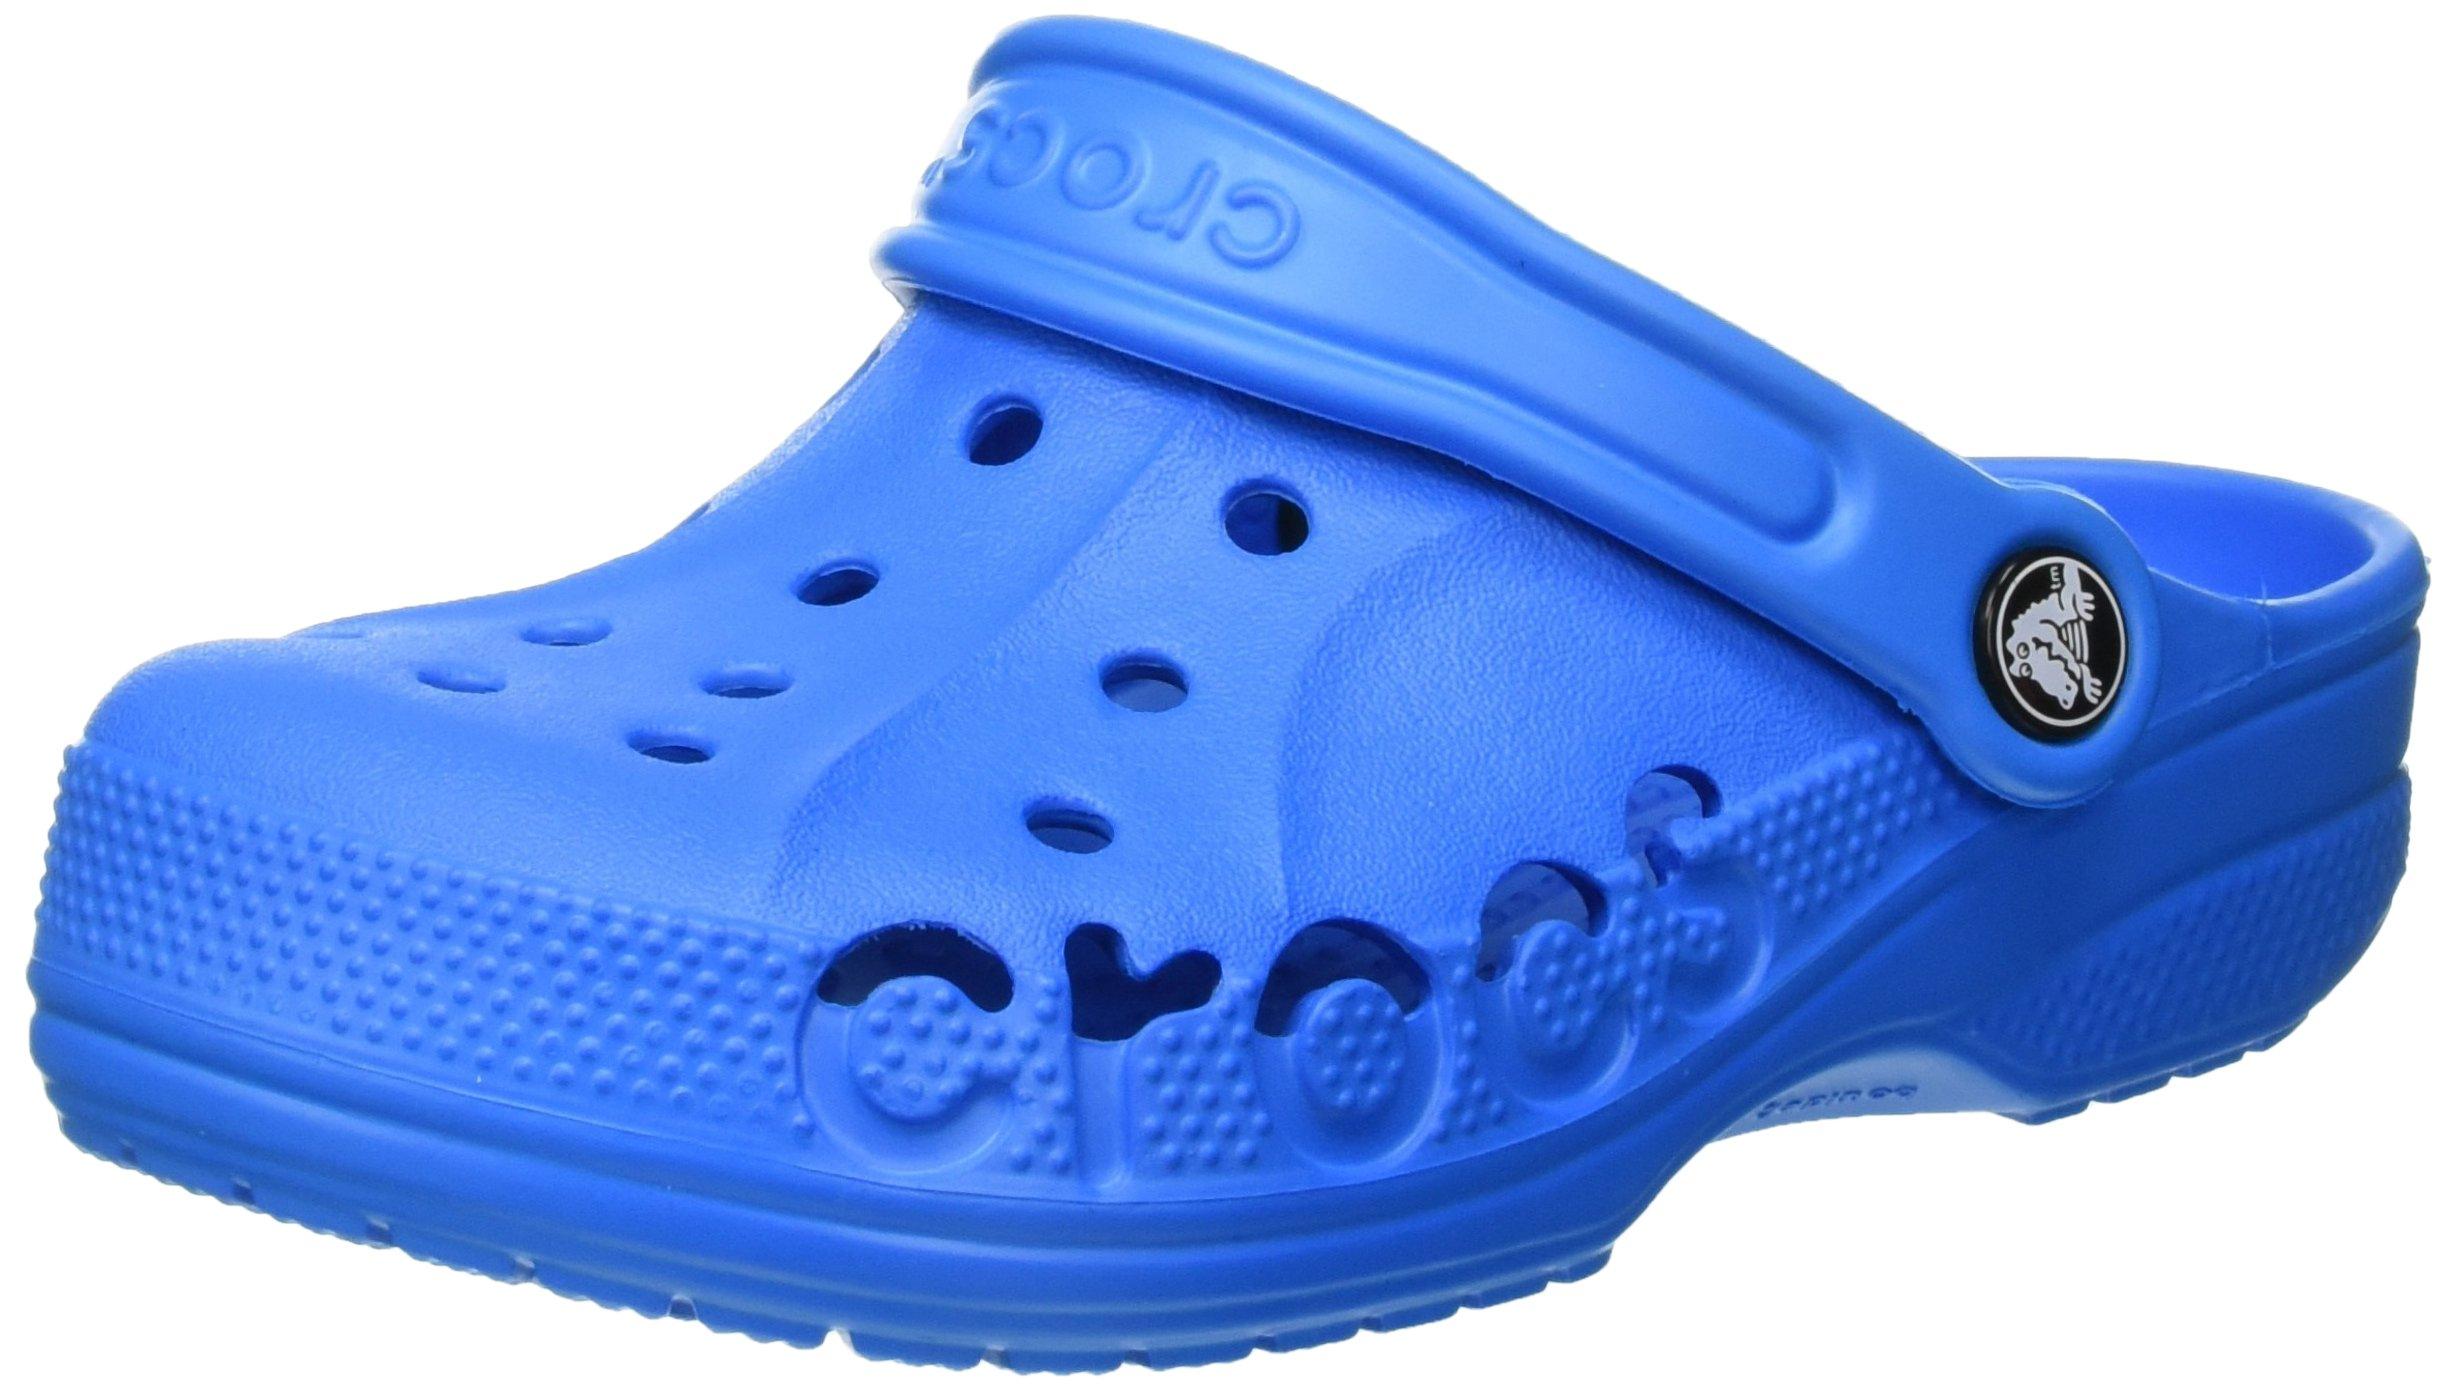 Crocs Kids' Baya 10190 Clog, Ocean, 8-9 M US Toddler by Crocs (Image #1)